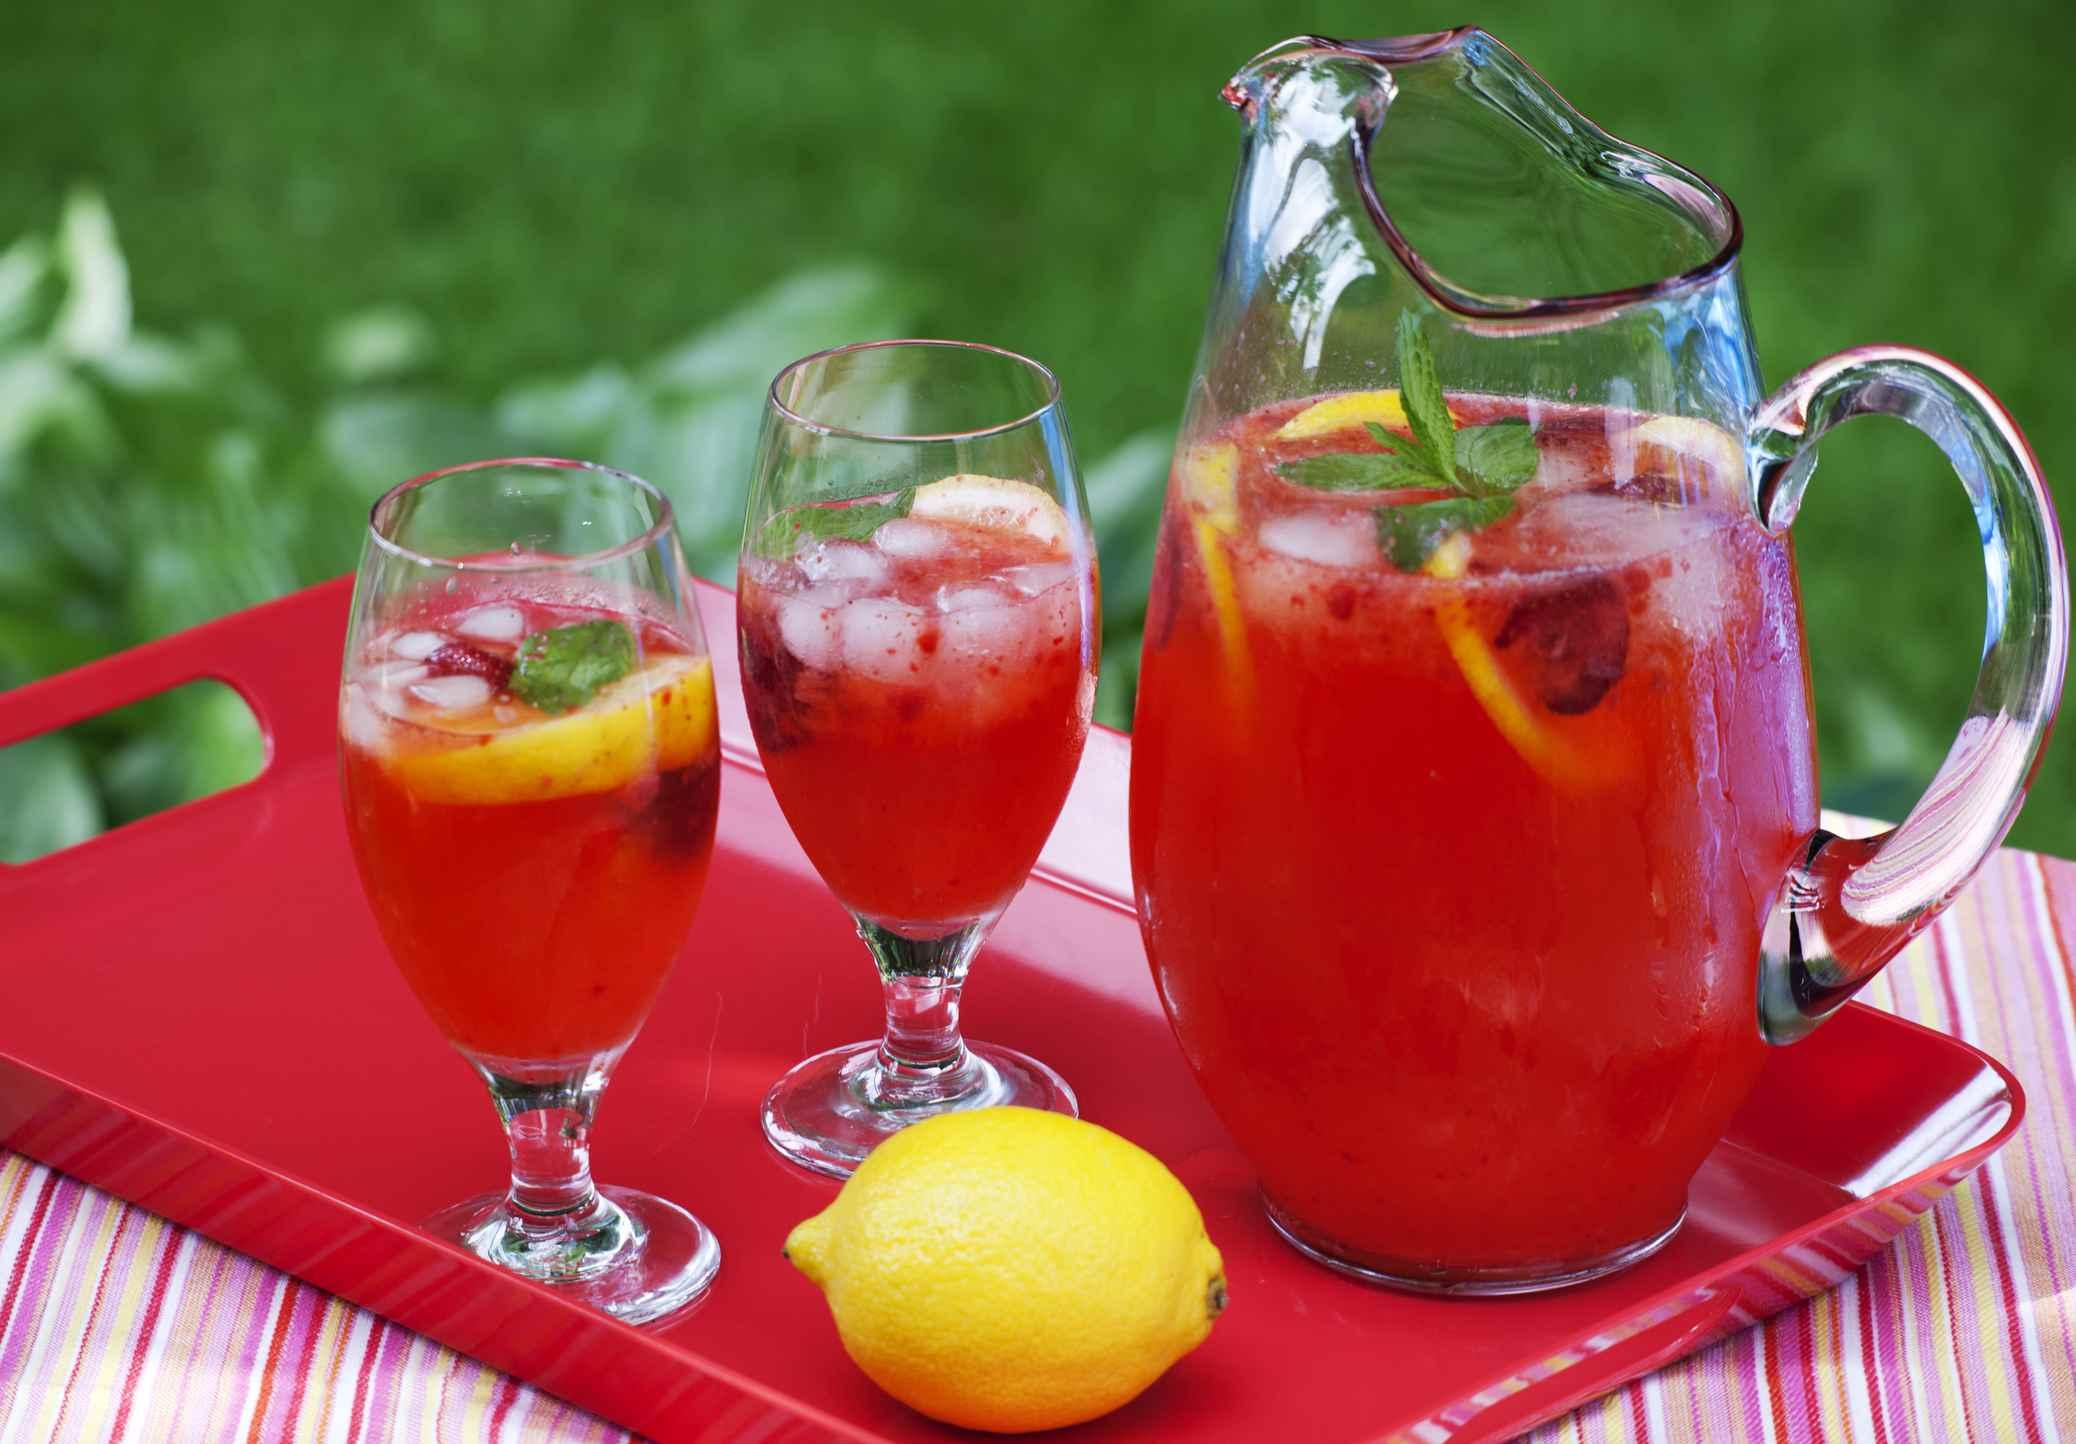 Strawberry lemoade